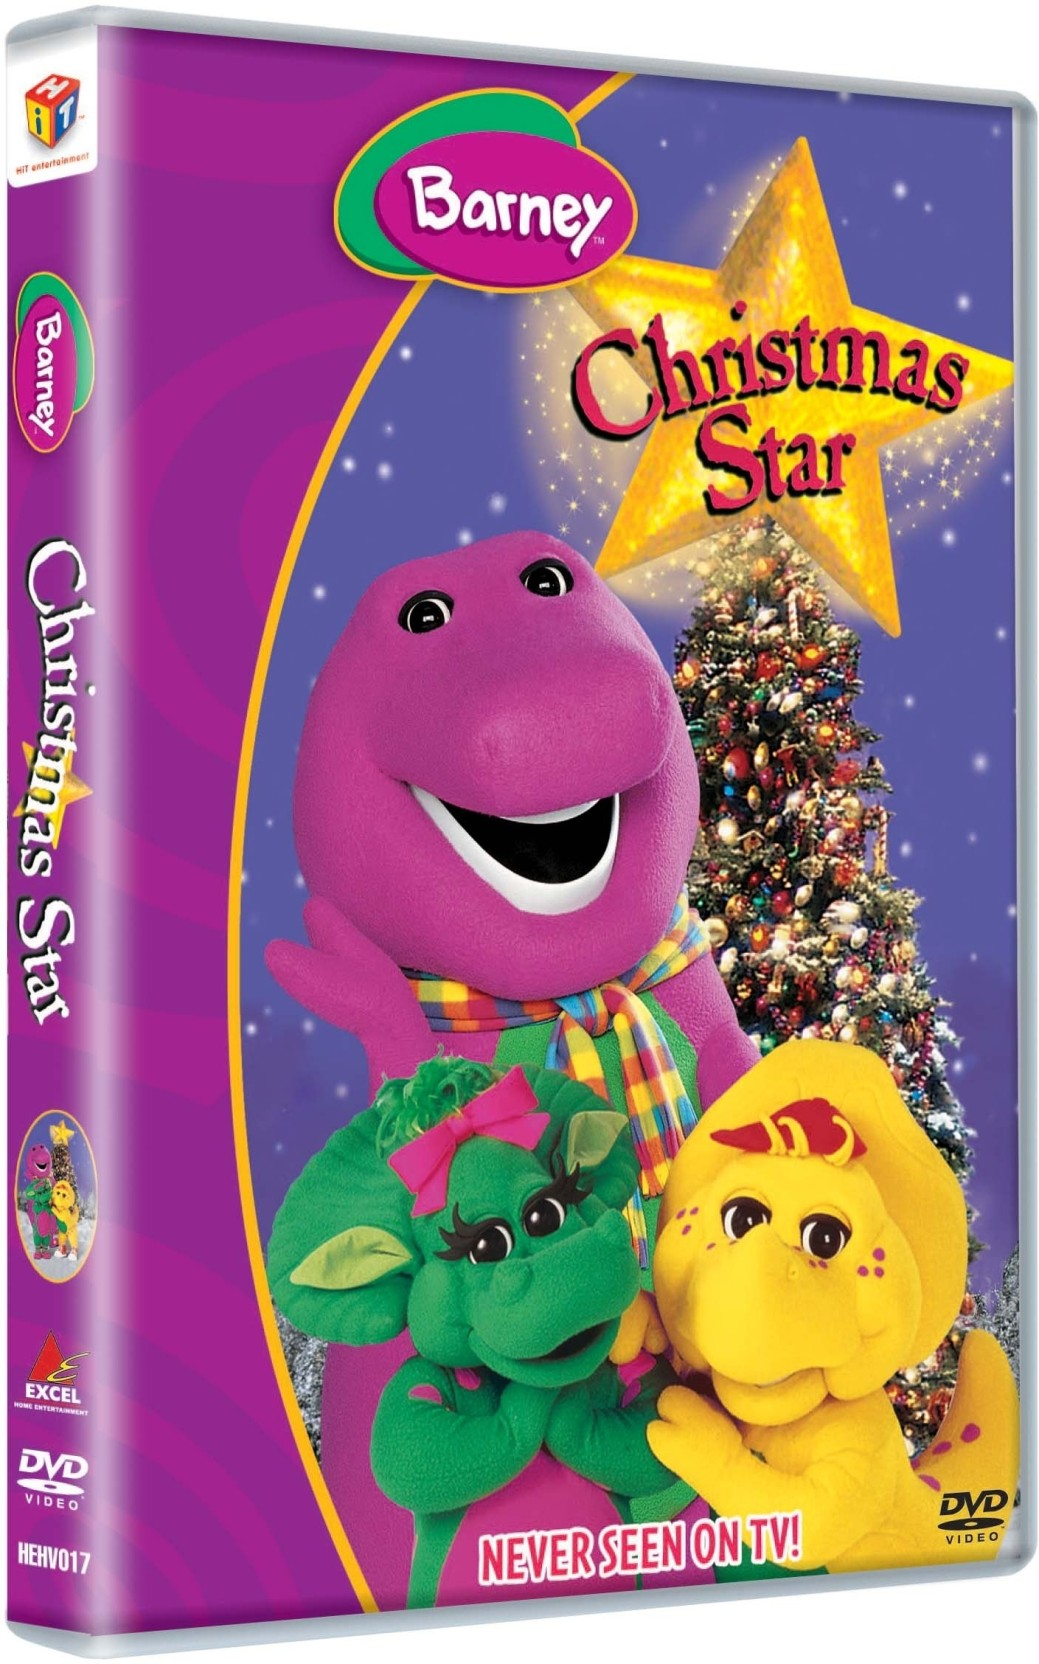 Barney Christmas Star Price in India - Buy Barney Christmas Star ...